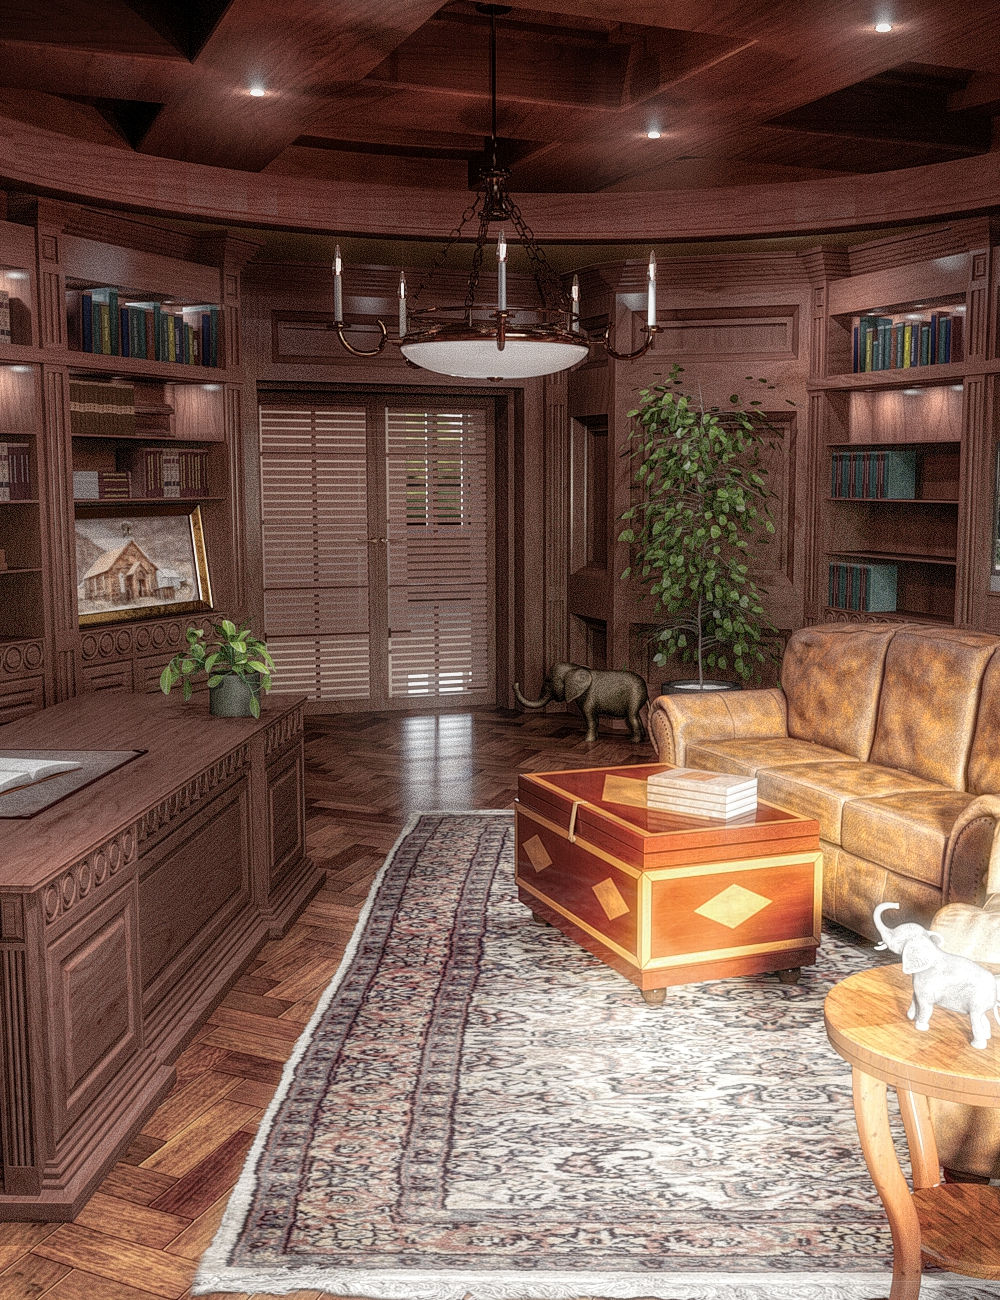 FG Dean's Office by: Fugazi1968, 3D Models by Daz 3D